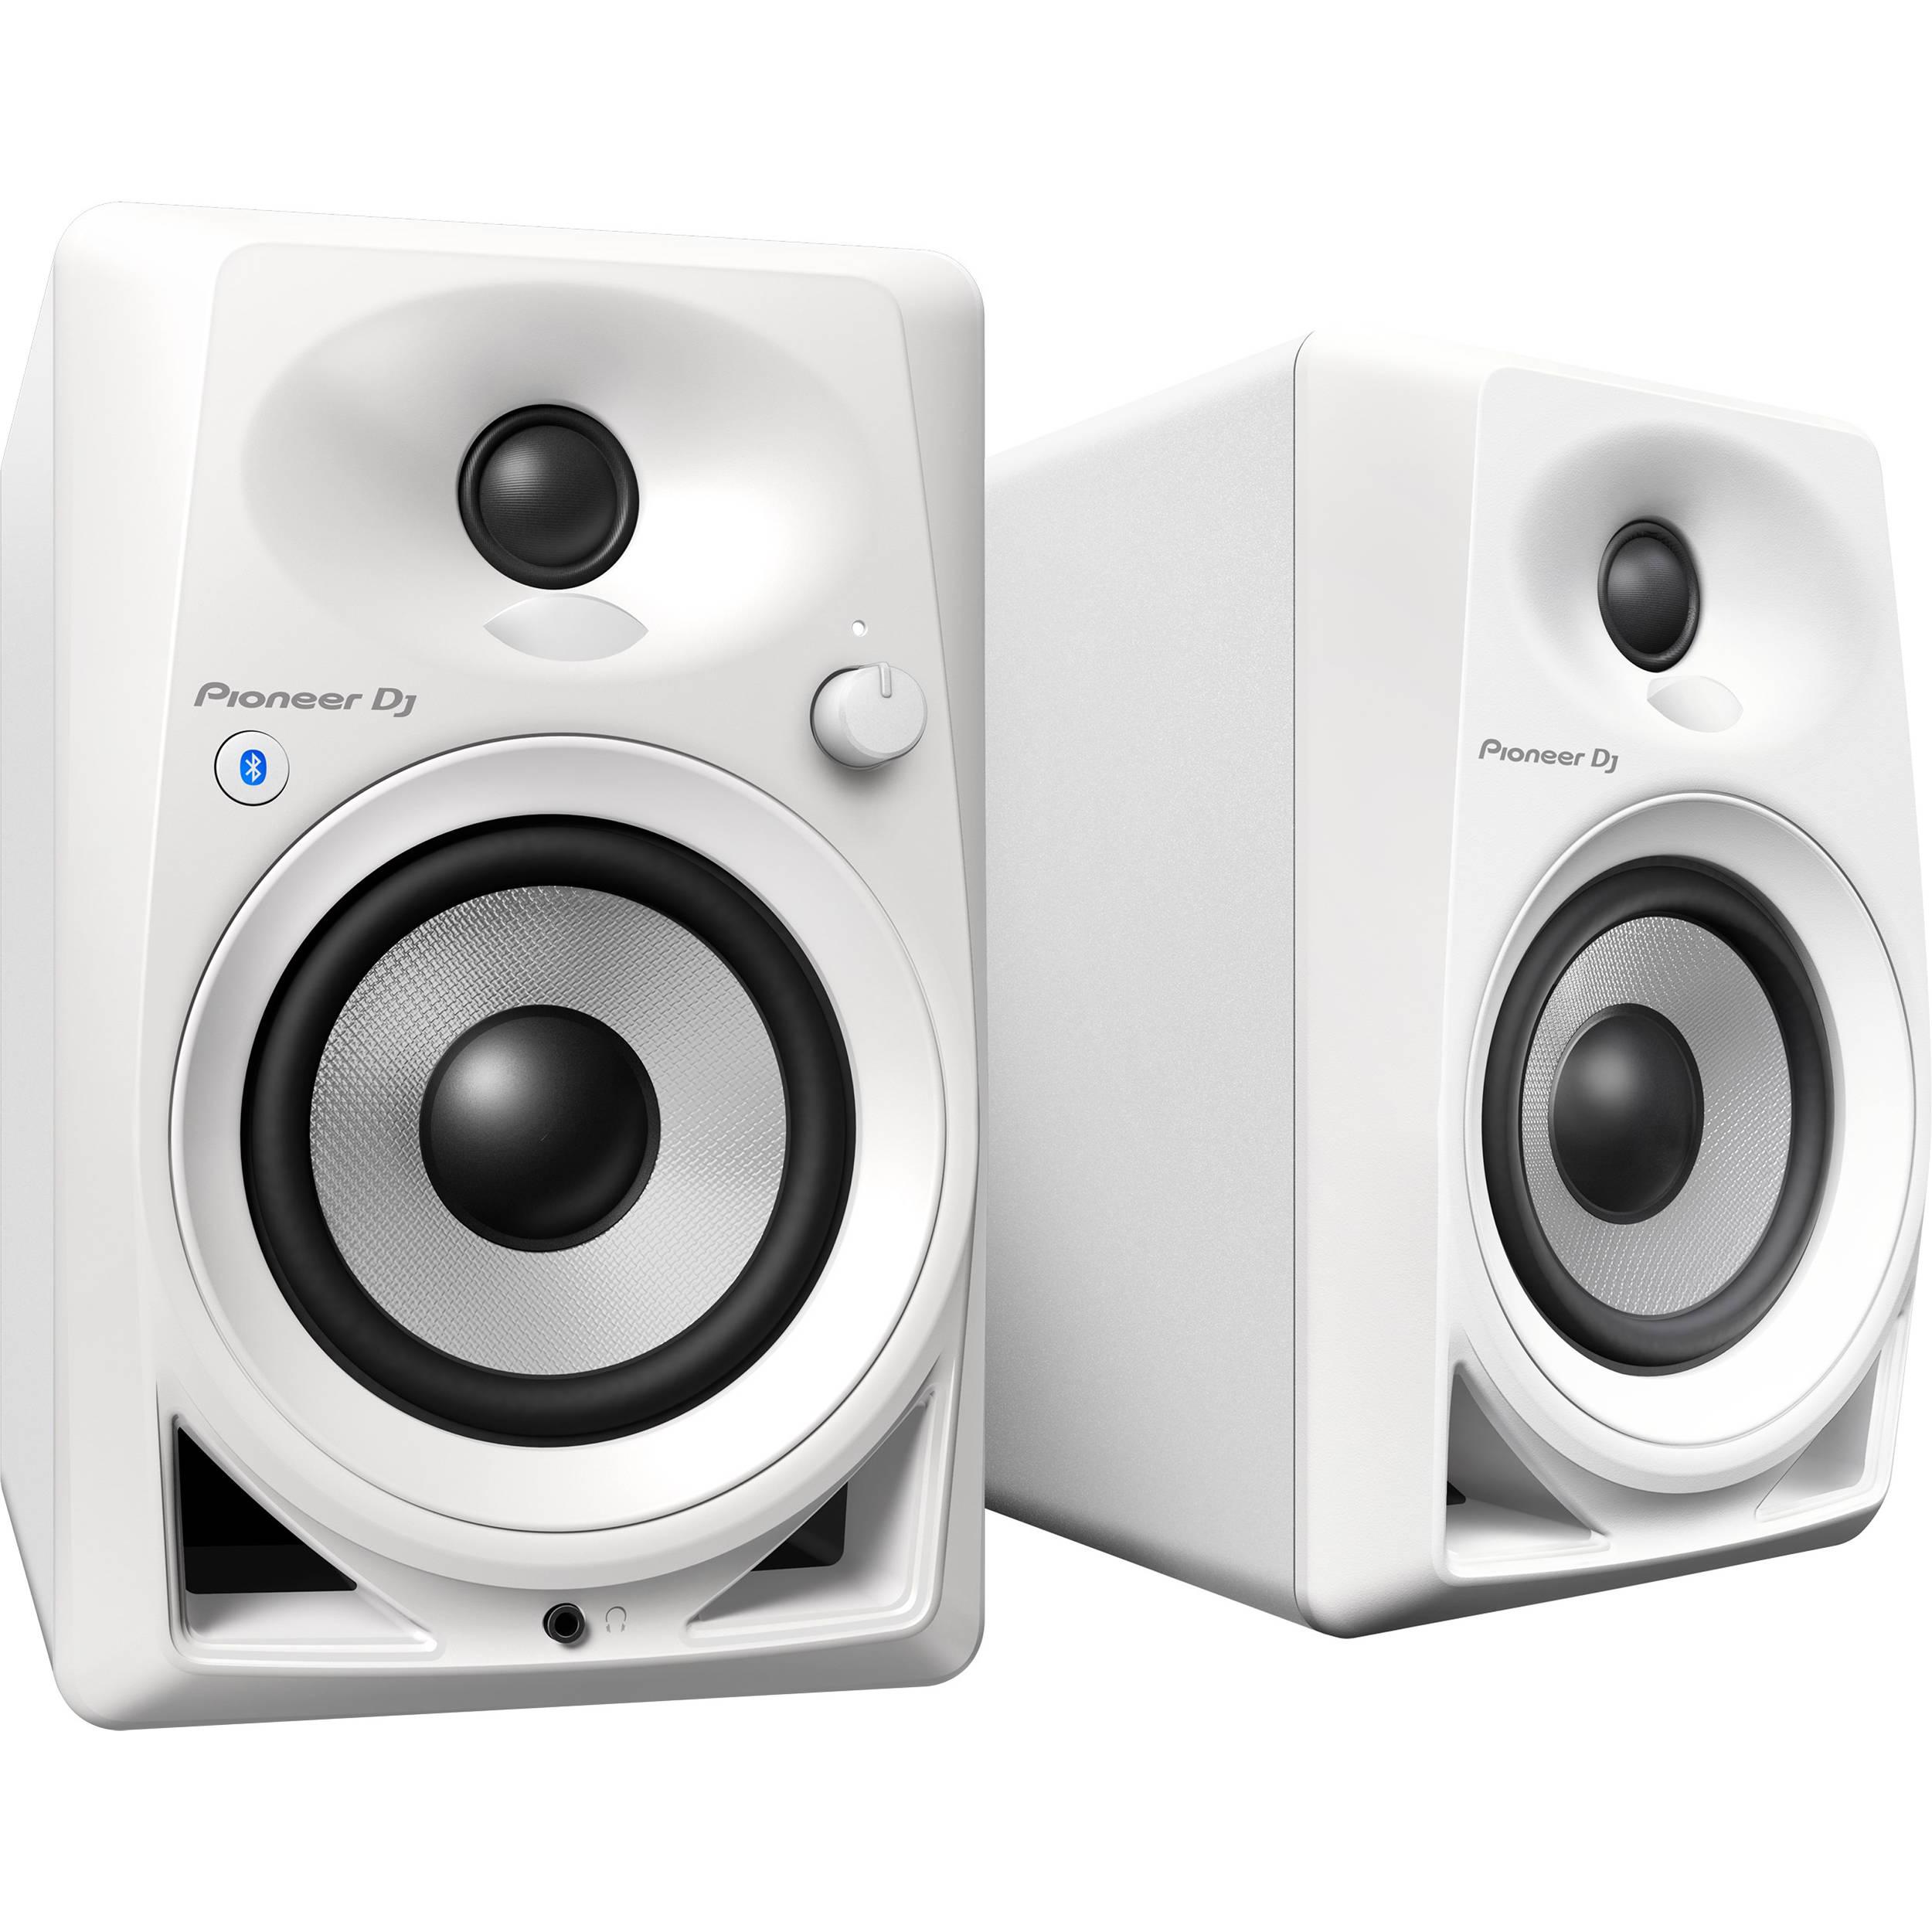 2500x2500 speaker drawing dj speaker for free download